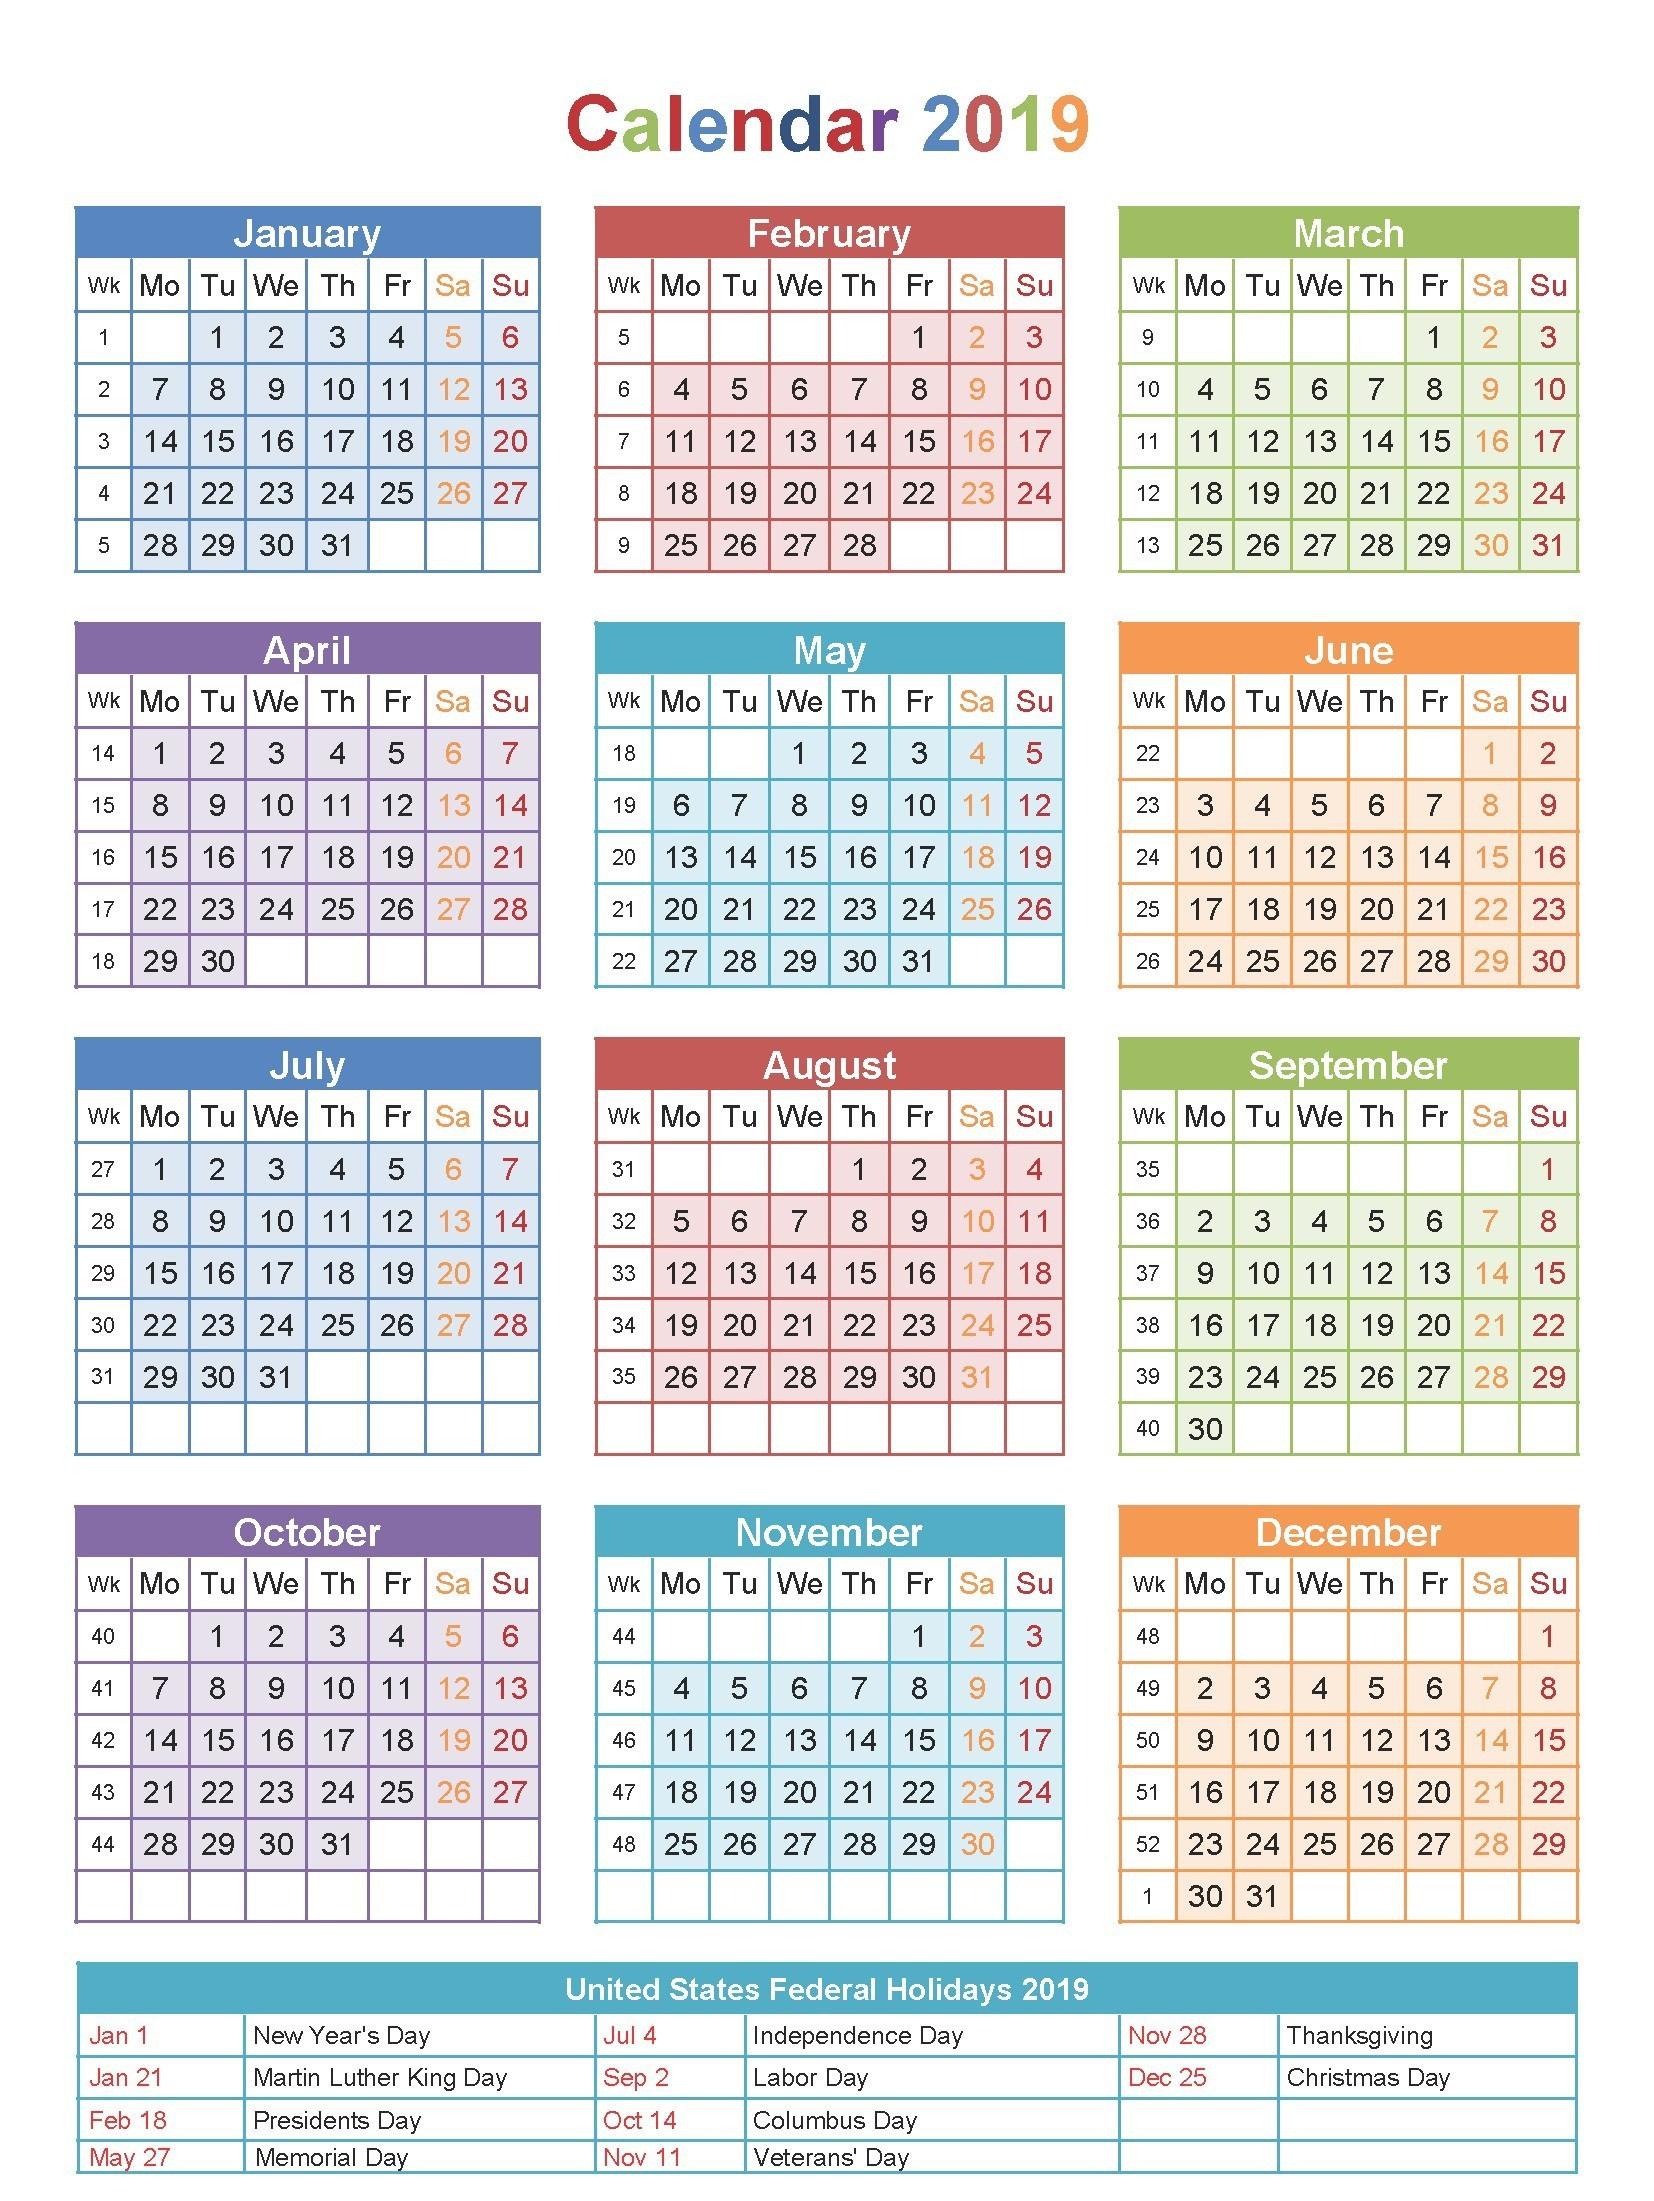 Blank Calendar 2019 Excel Más Recientes Myanmar Calendar 2019 Printable Image Of Calendar Academic Of Blank Calendar 2019 Excel Más Reciente Free Printable 2019 Calendar